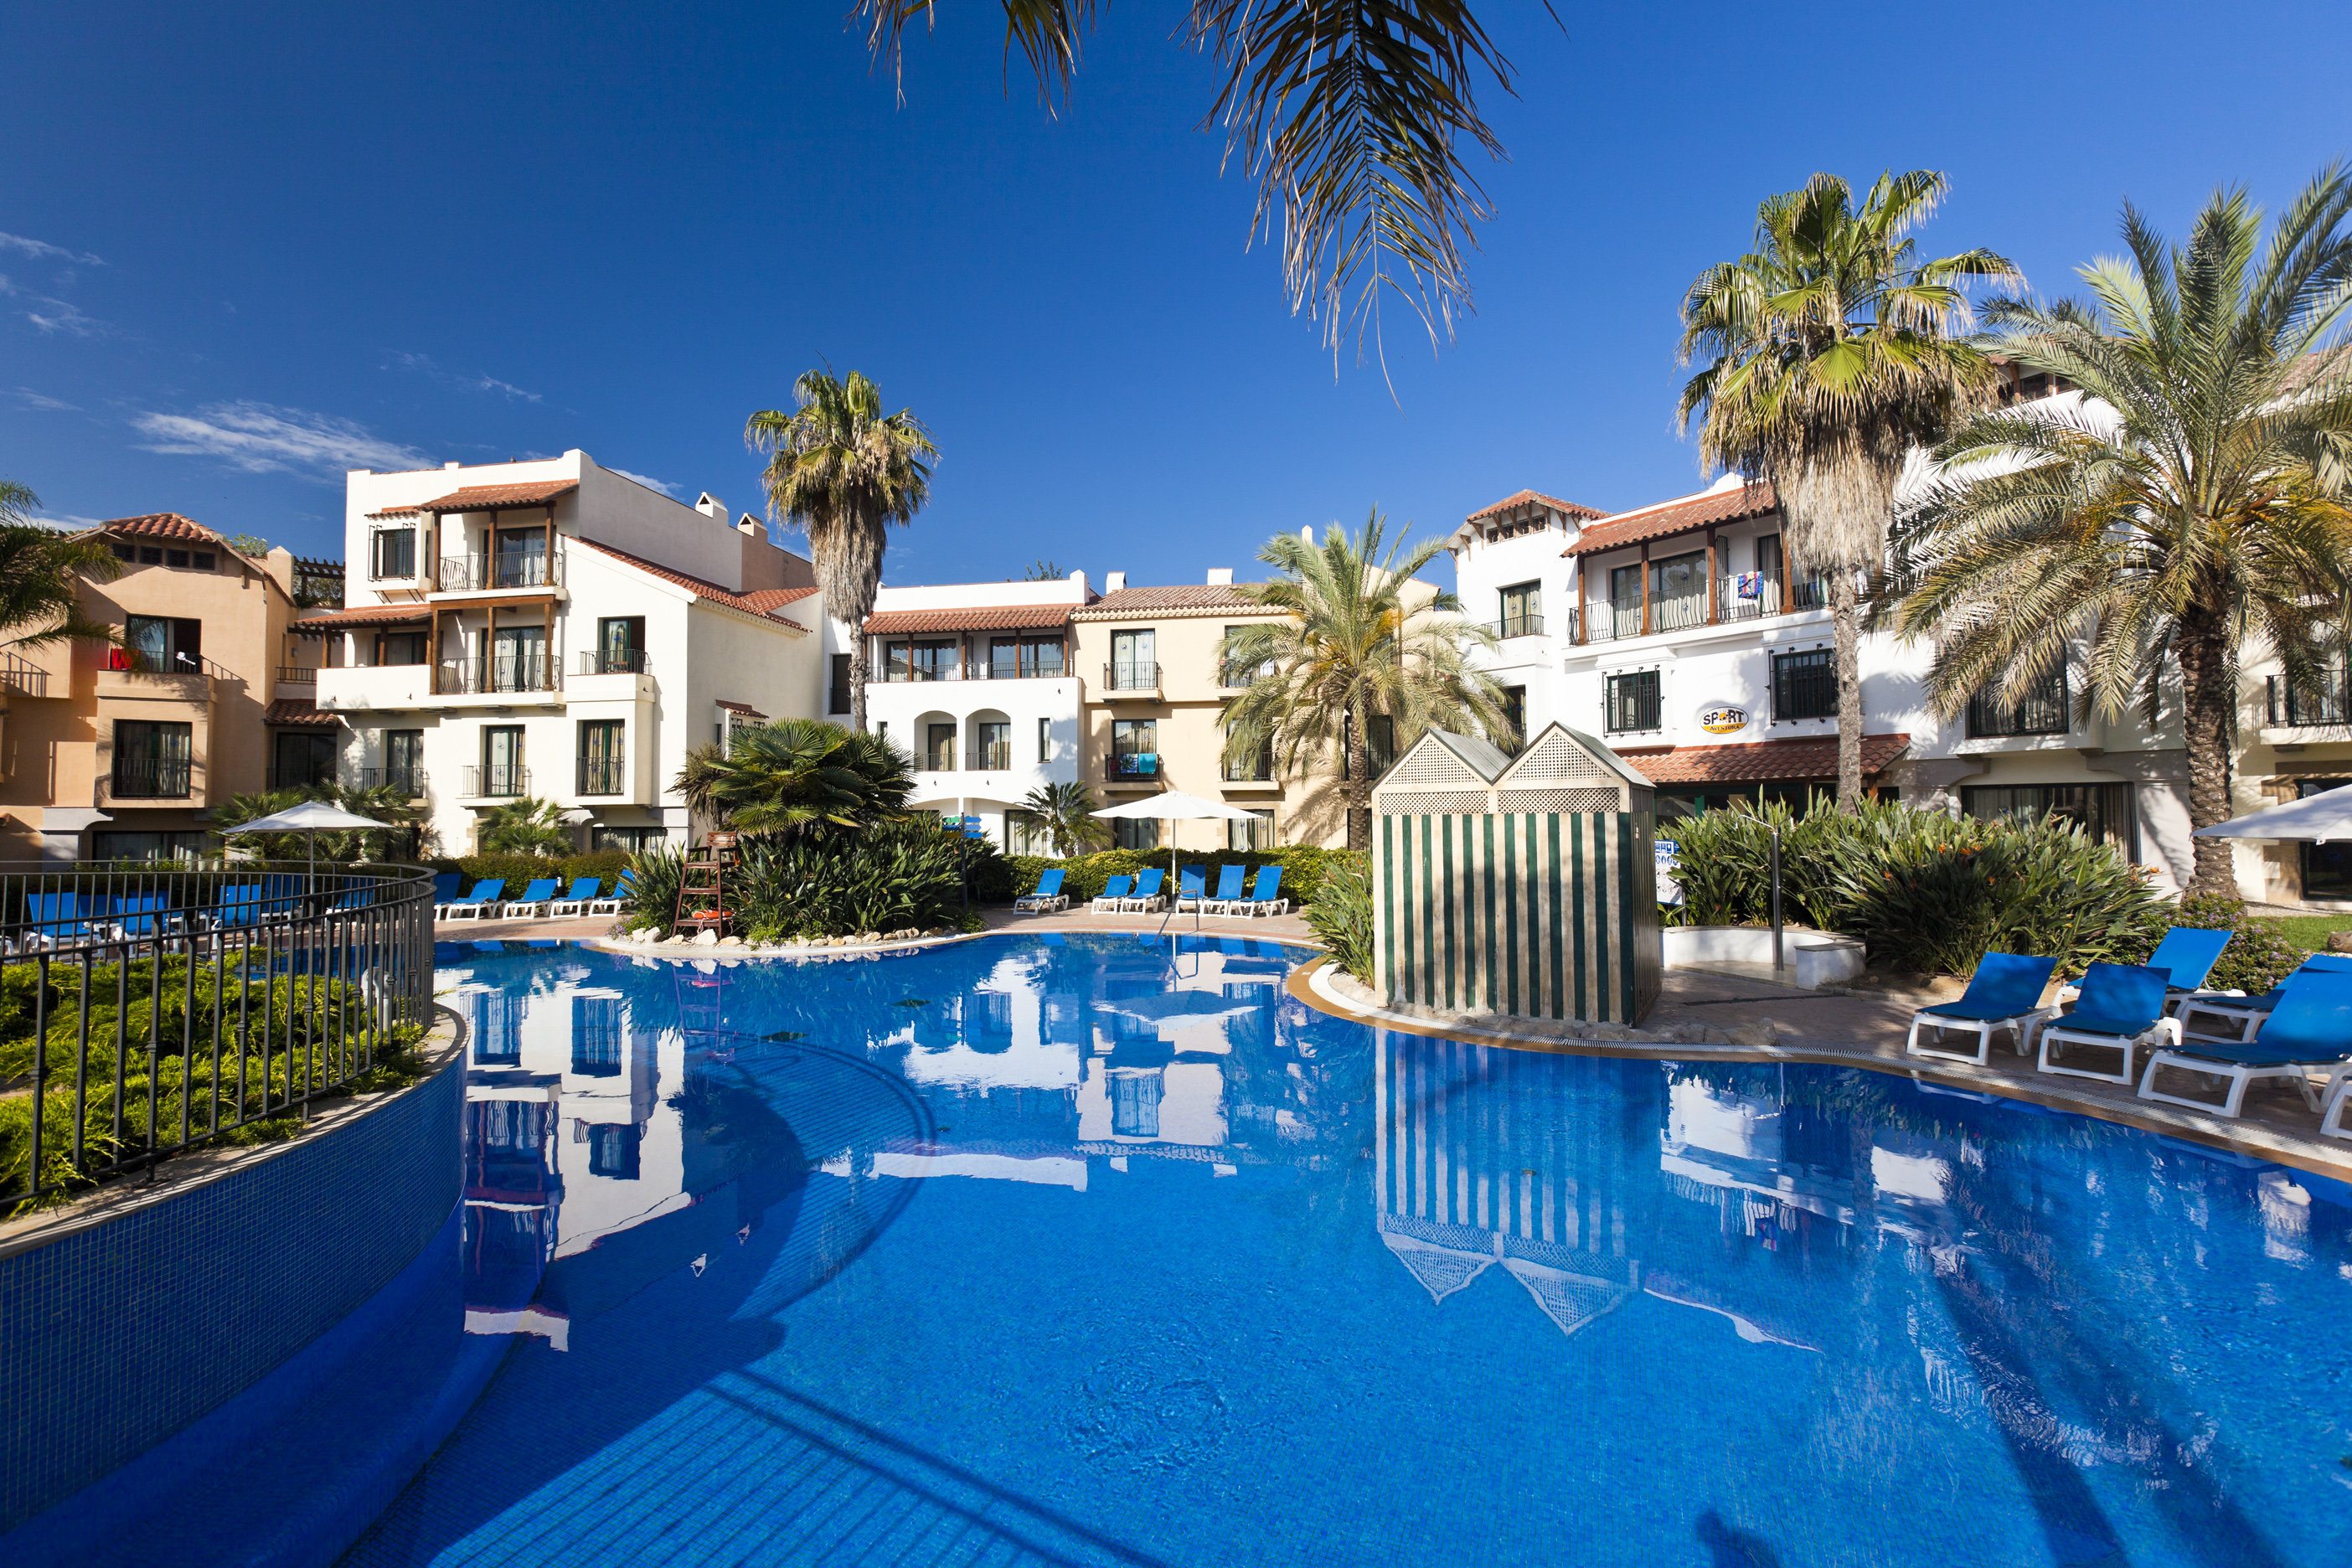 Portaventura® Hotel Portaventura ! Park Tickets I